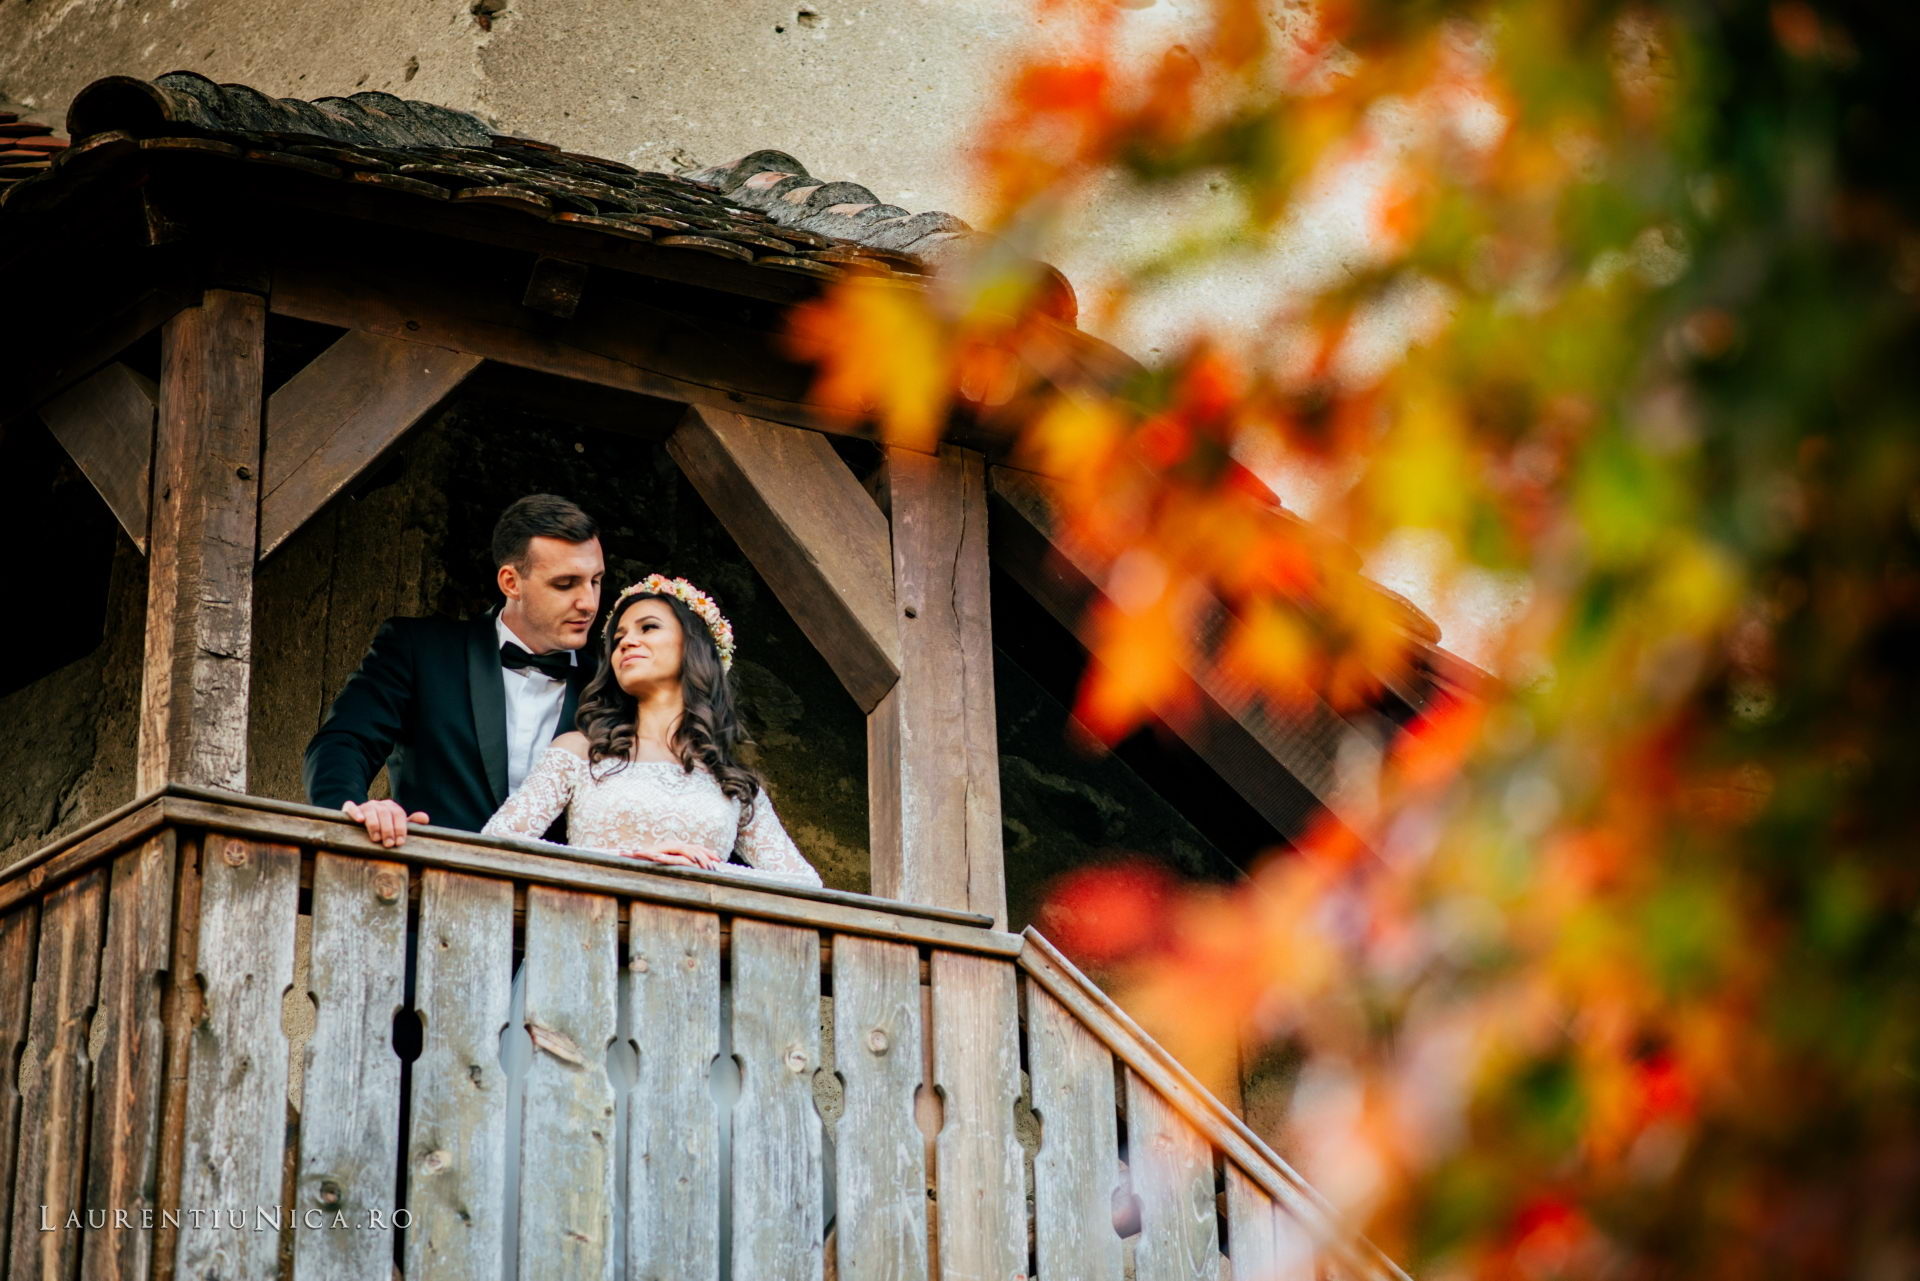 lili-si-dan-fotografii-nunta-after-wedding-sighisoara-laurentiu-nica37